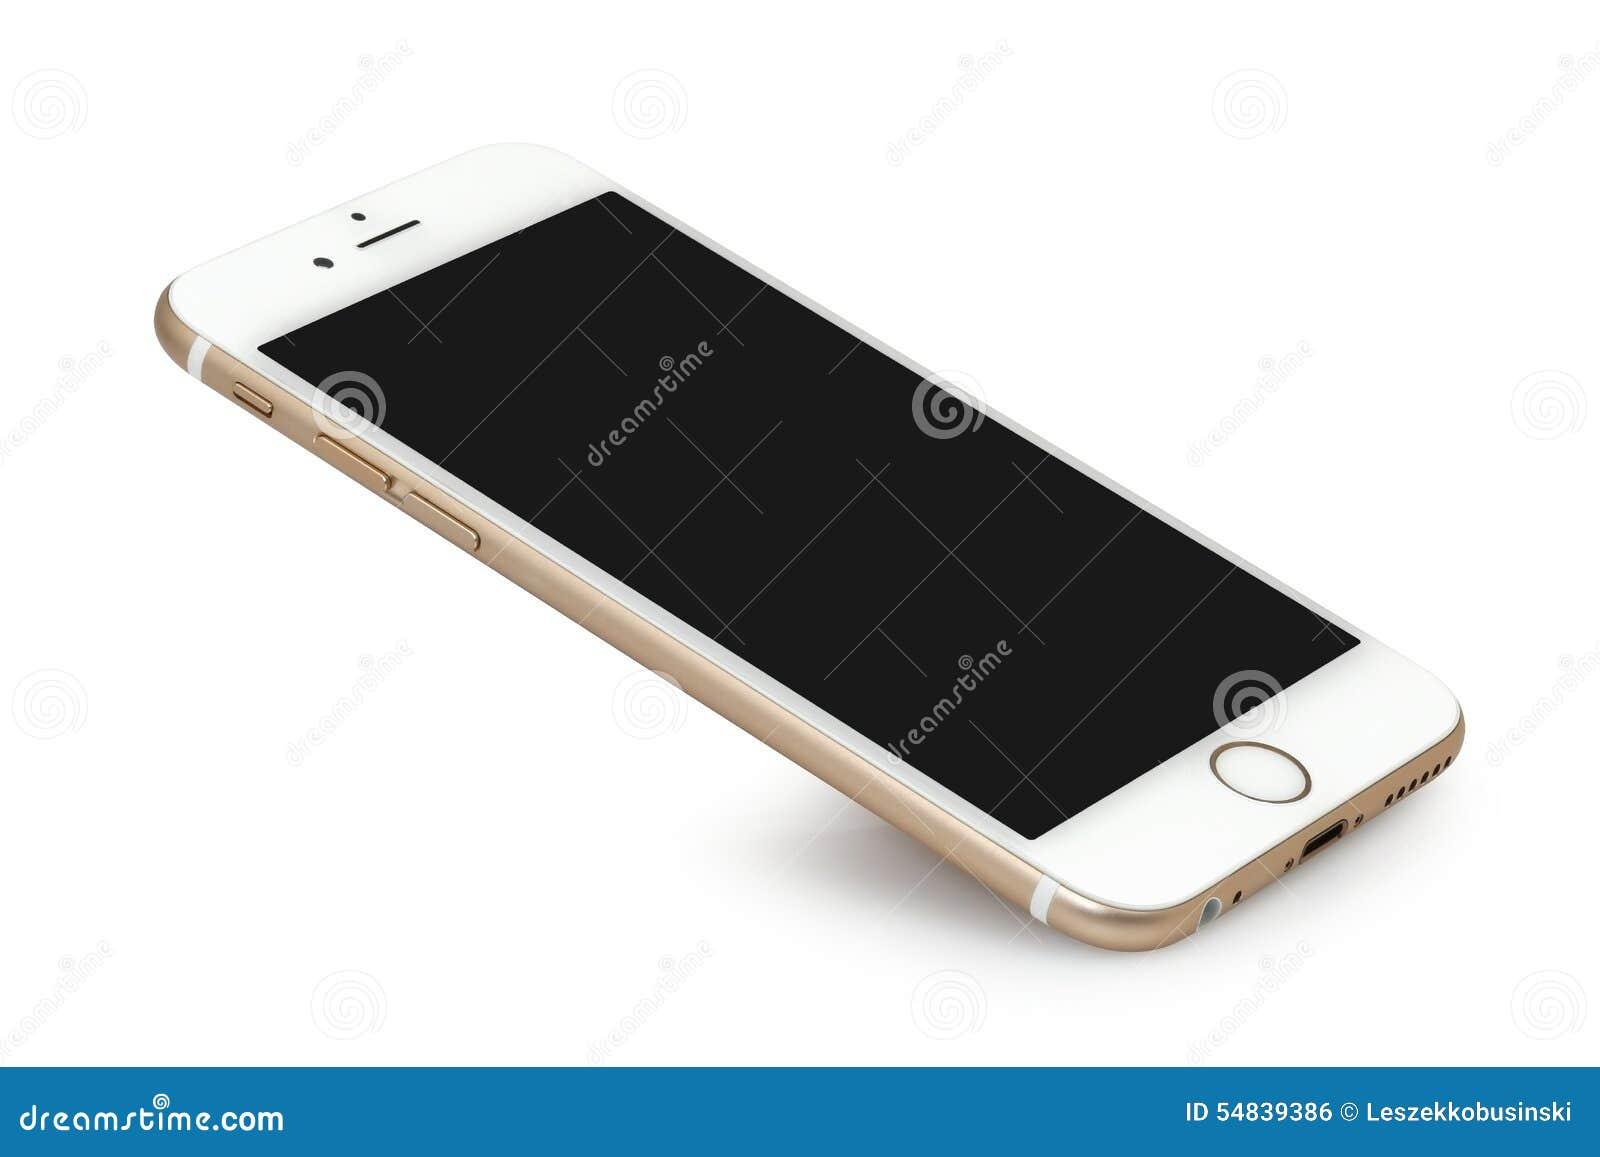 Iphone 6 avec l 39 cran vide photo ditorial image 54839386 for Photo ecran avec iphone 7